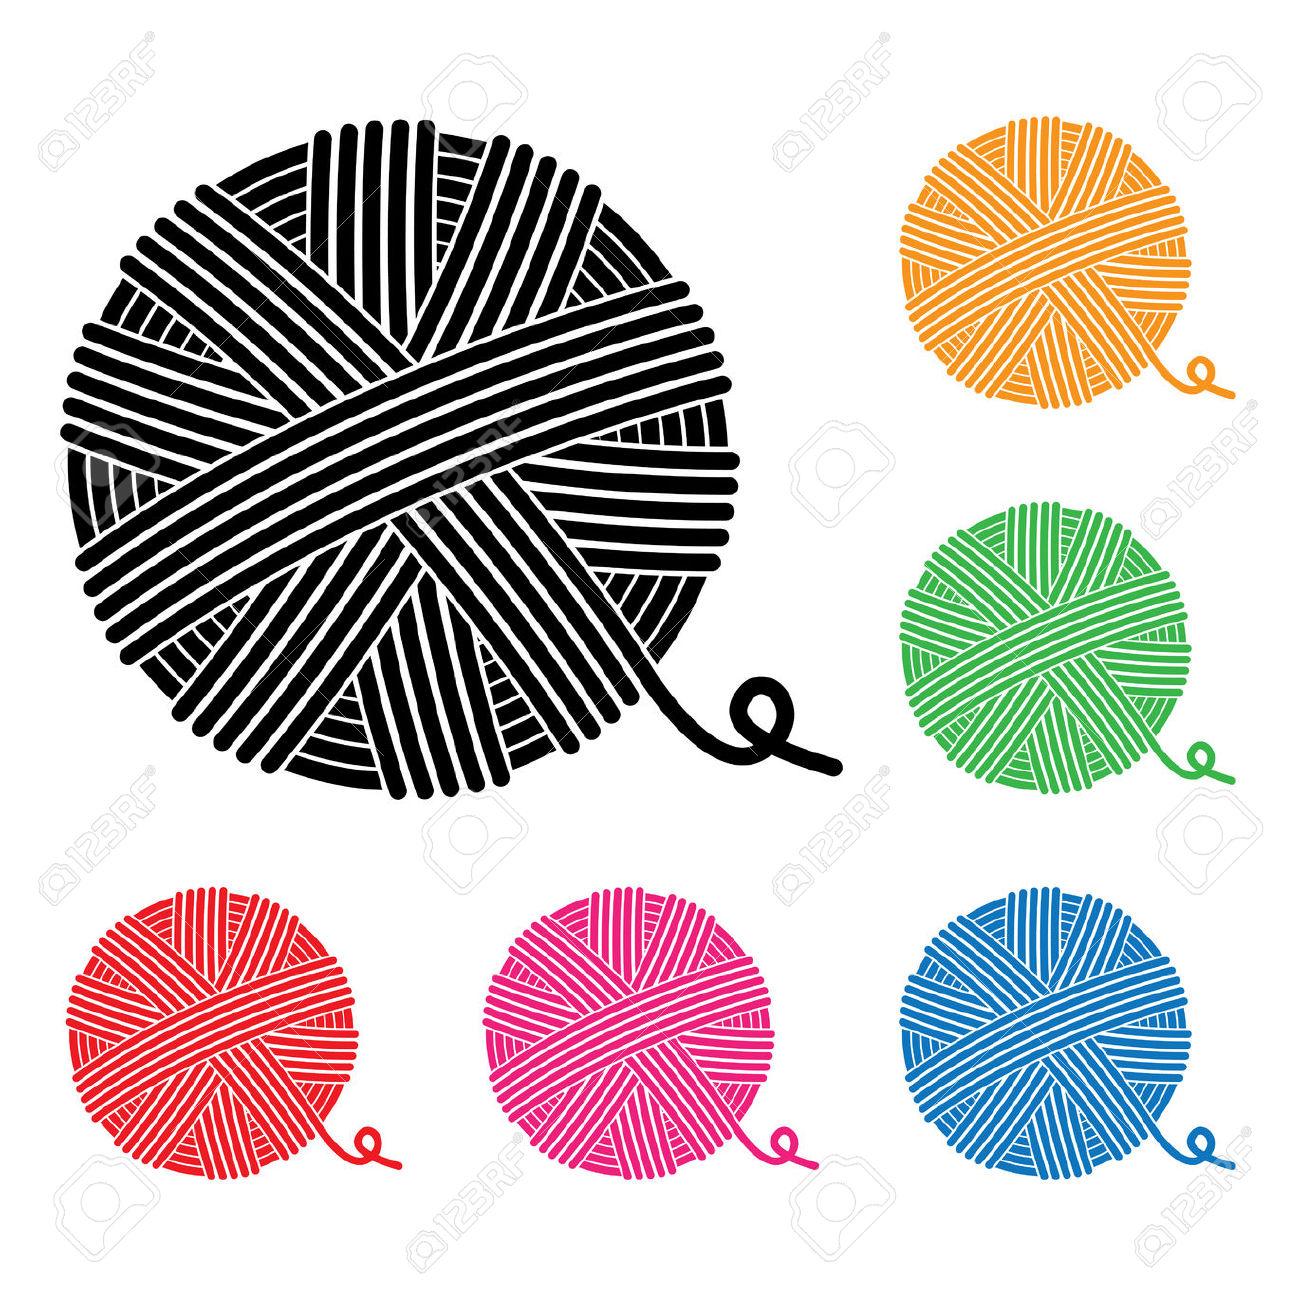 Vector Set Of Yarn Ball Icons Royalty Free Cliparts, Vectors, And.